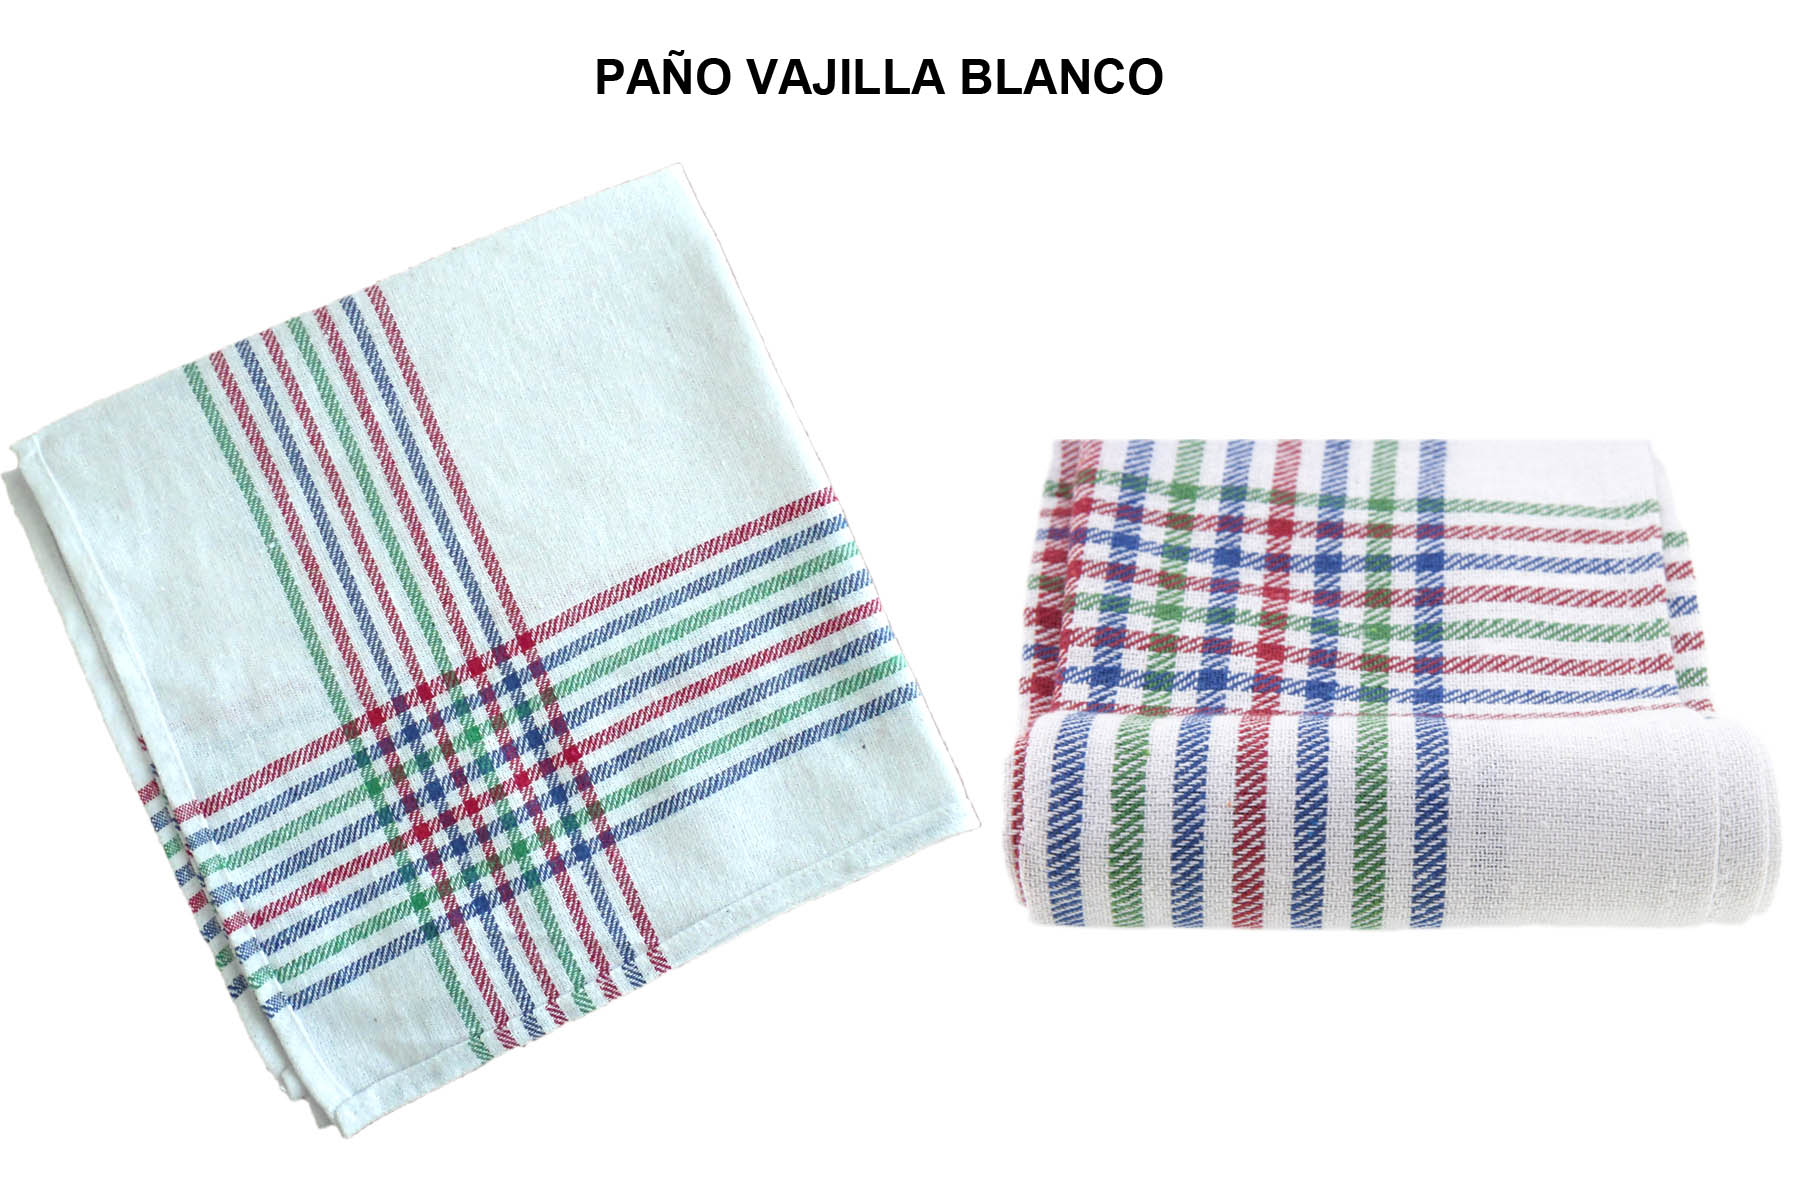 PAÑO VAJILLA BLANCO